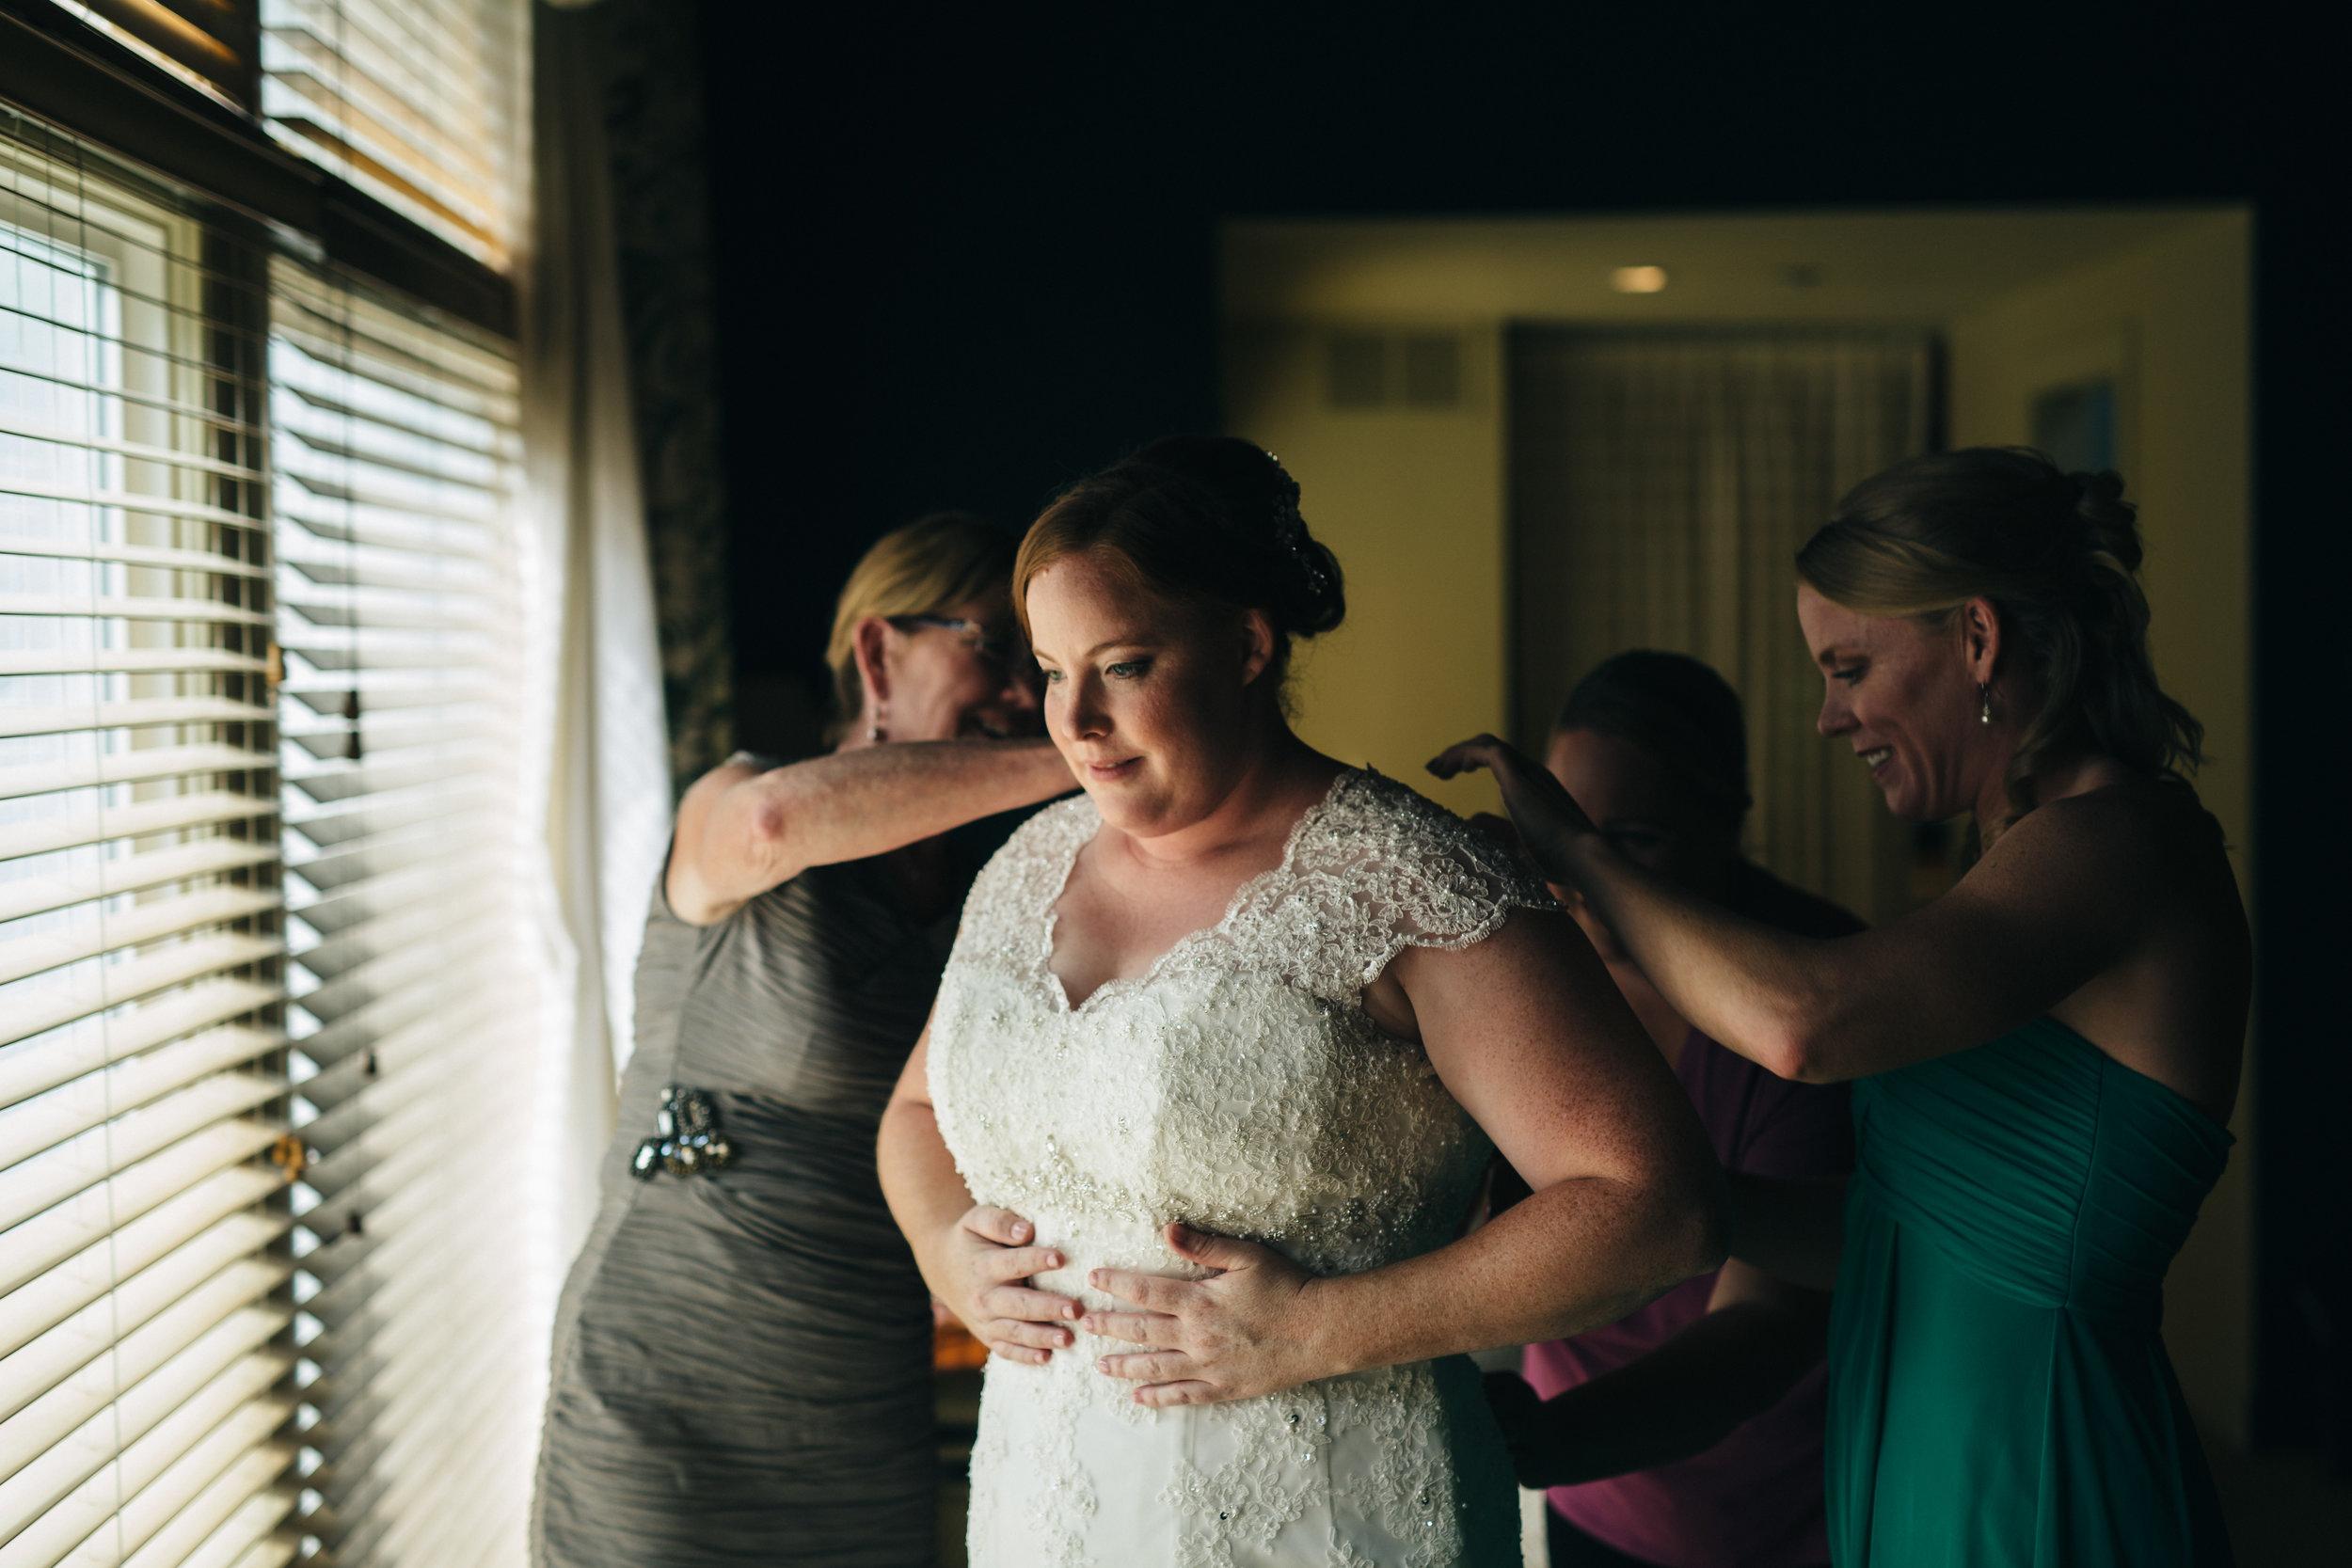 Wedding photography at Walden Inn & Spa near Cleveland, Ohio.